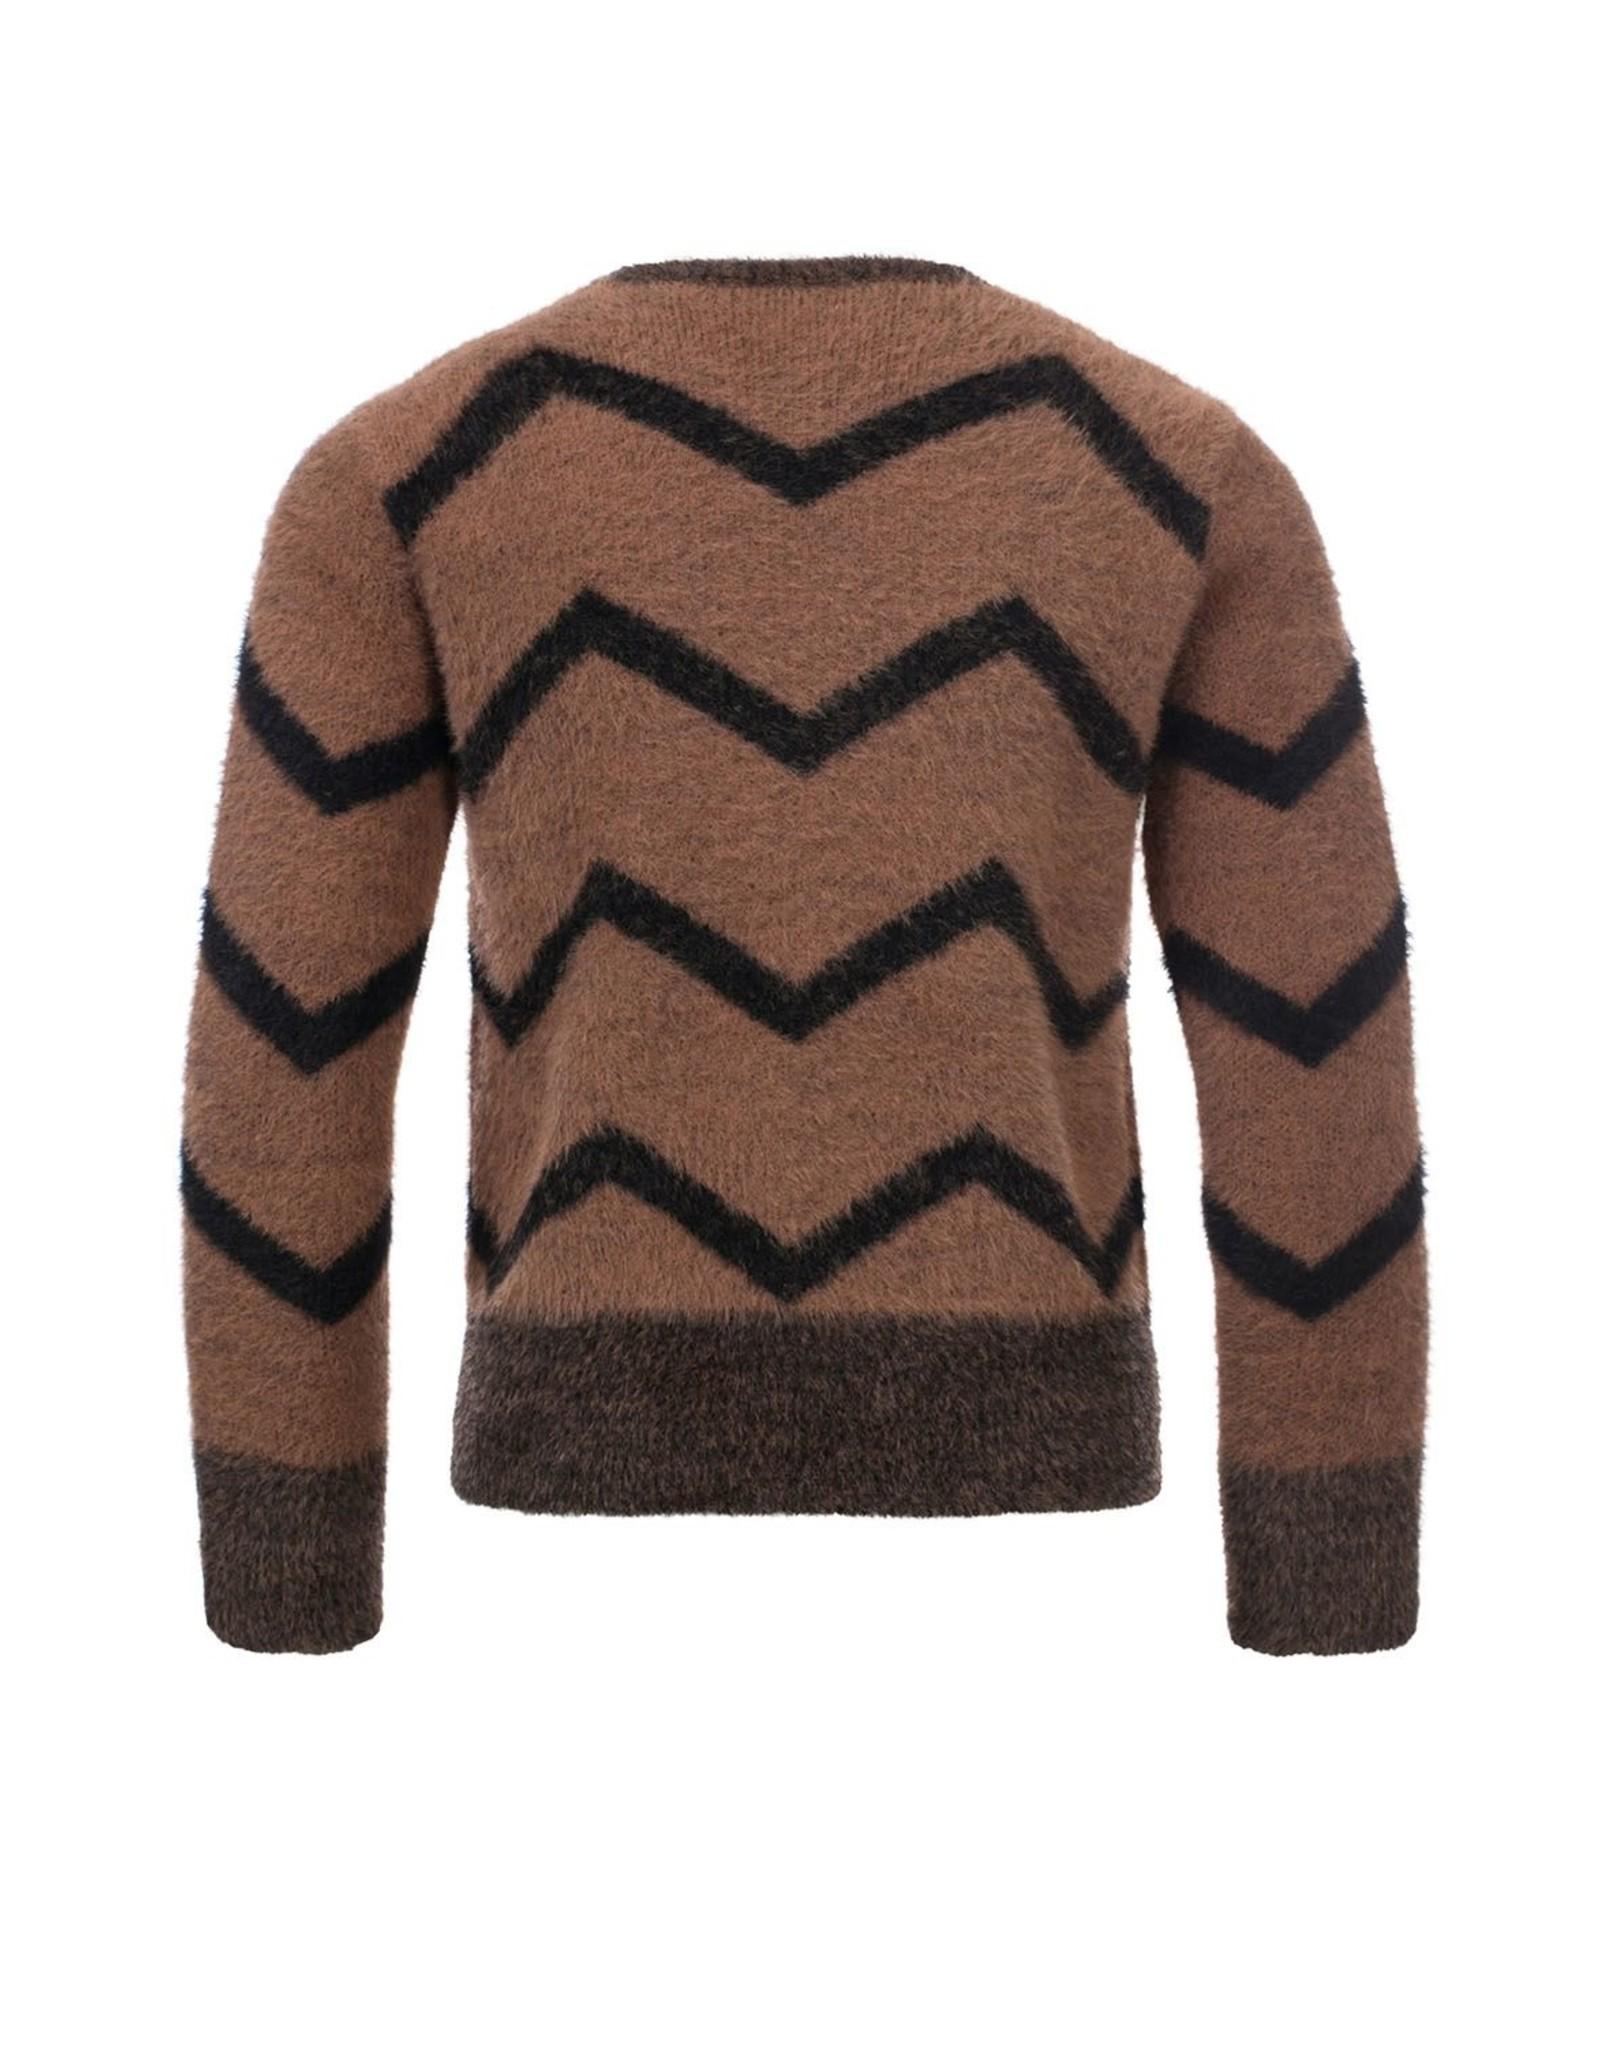 Looxs 10SIXTEEN 10Sixteen pullover1